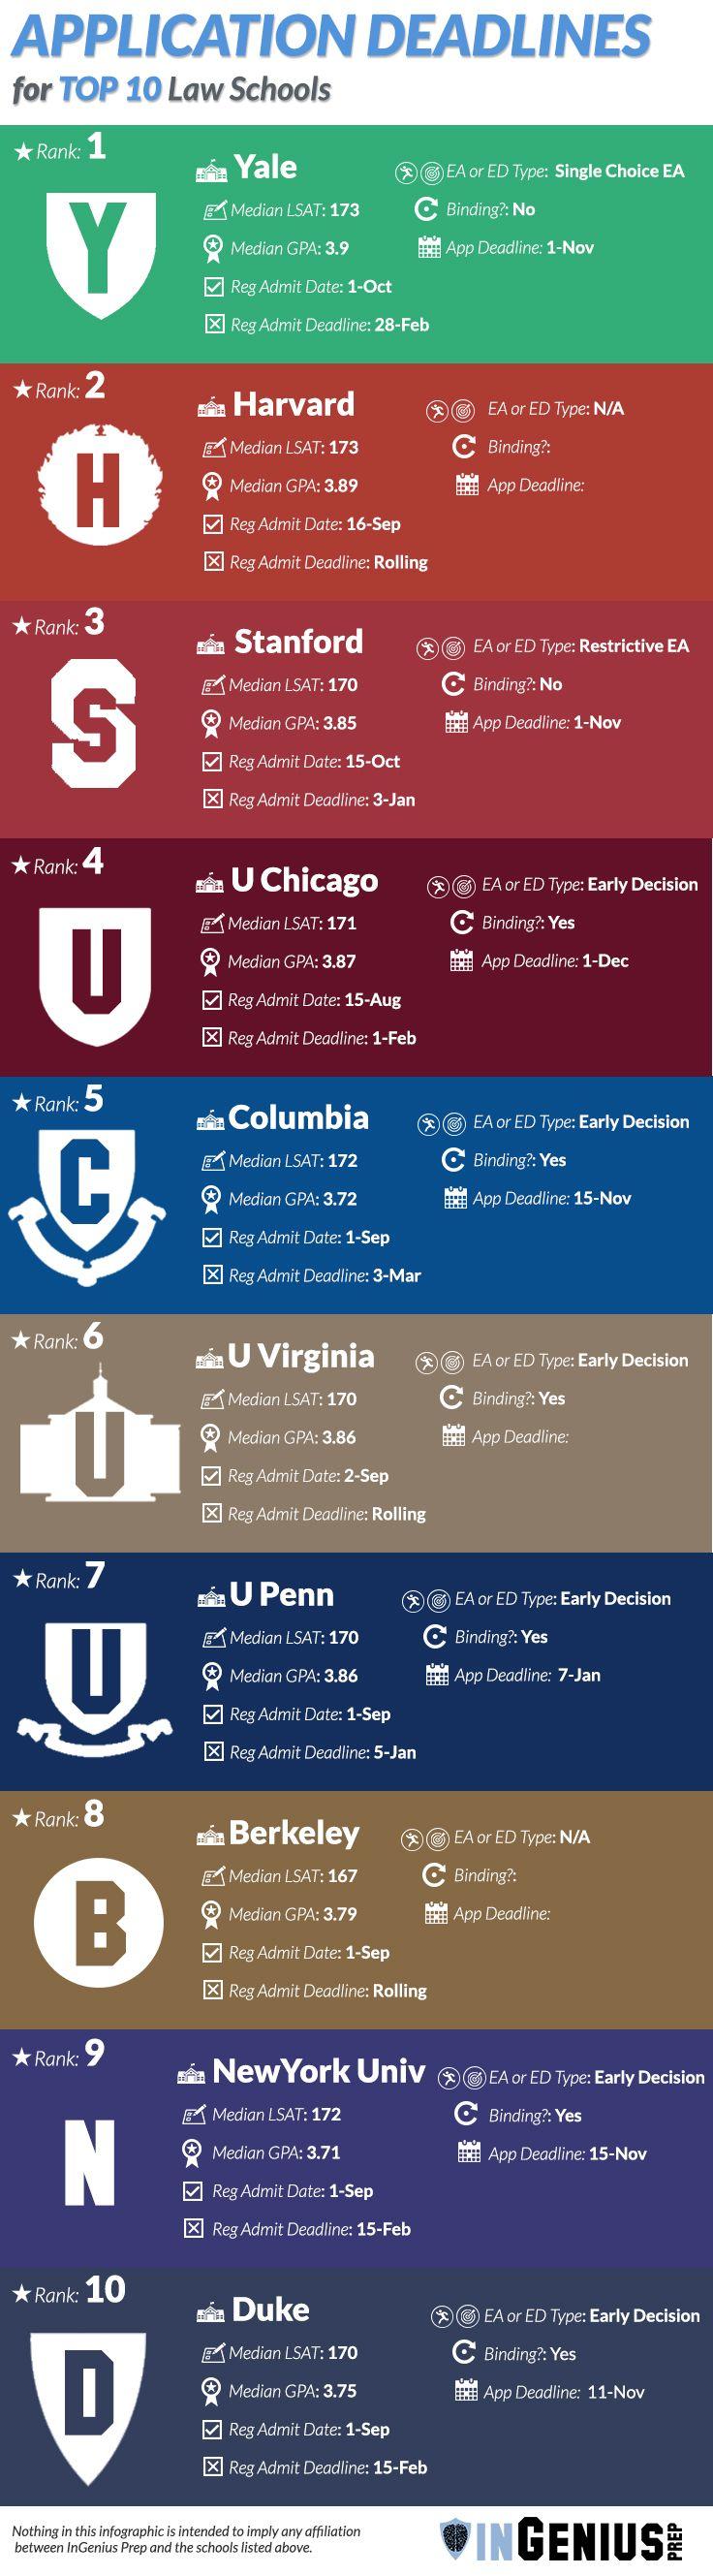 Law School Application Deadlines, Average GPA, Average LSAT scores of Top 10 Law Schools:  http://ingeniusprep.com/blog/law-school-application-deadlines/